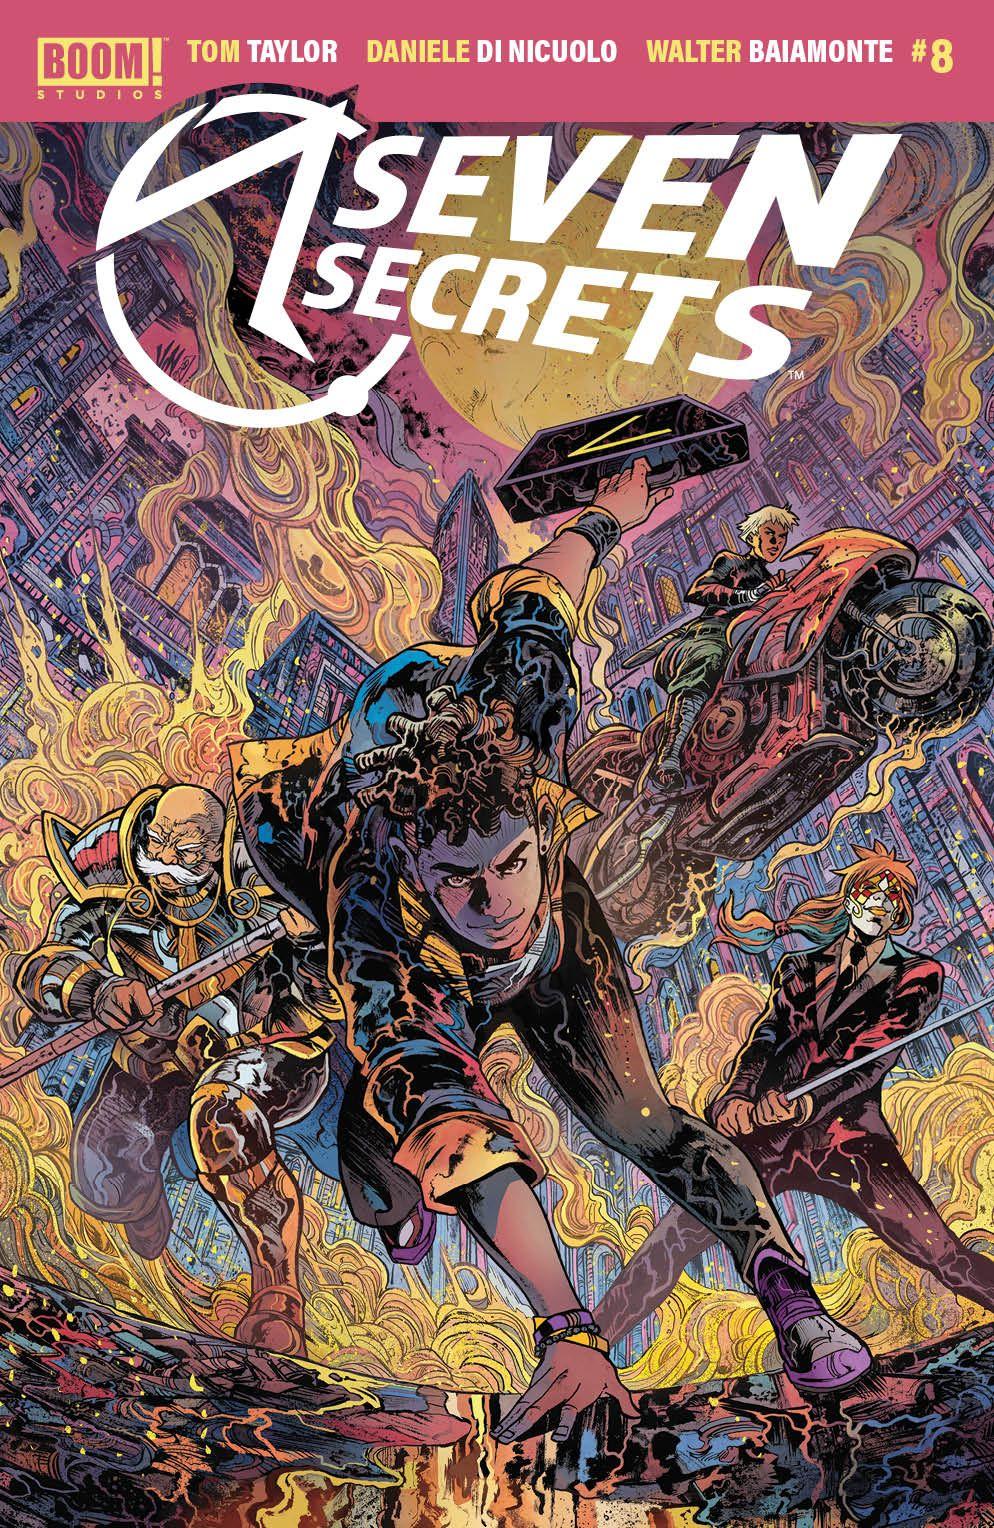 SevenSecrets_008_Cover_B_Variant ComicList Previews: SEVEN SECRETS #8